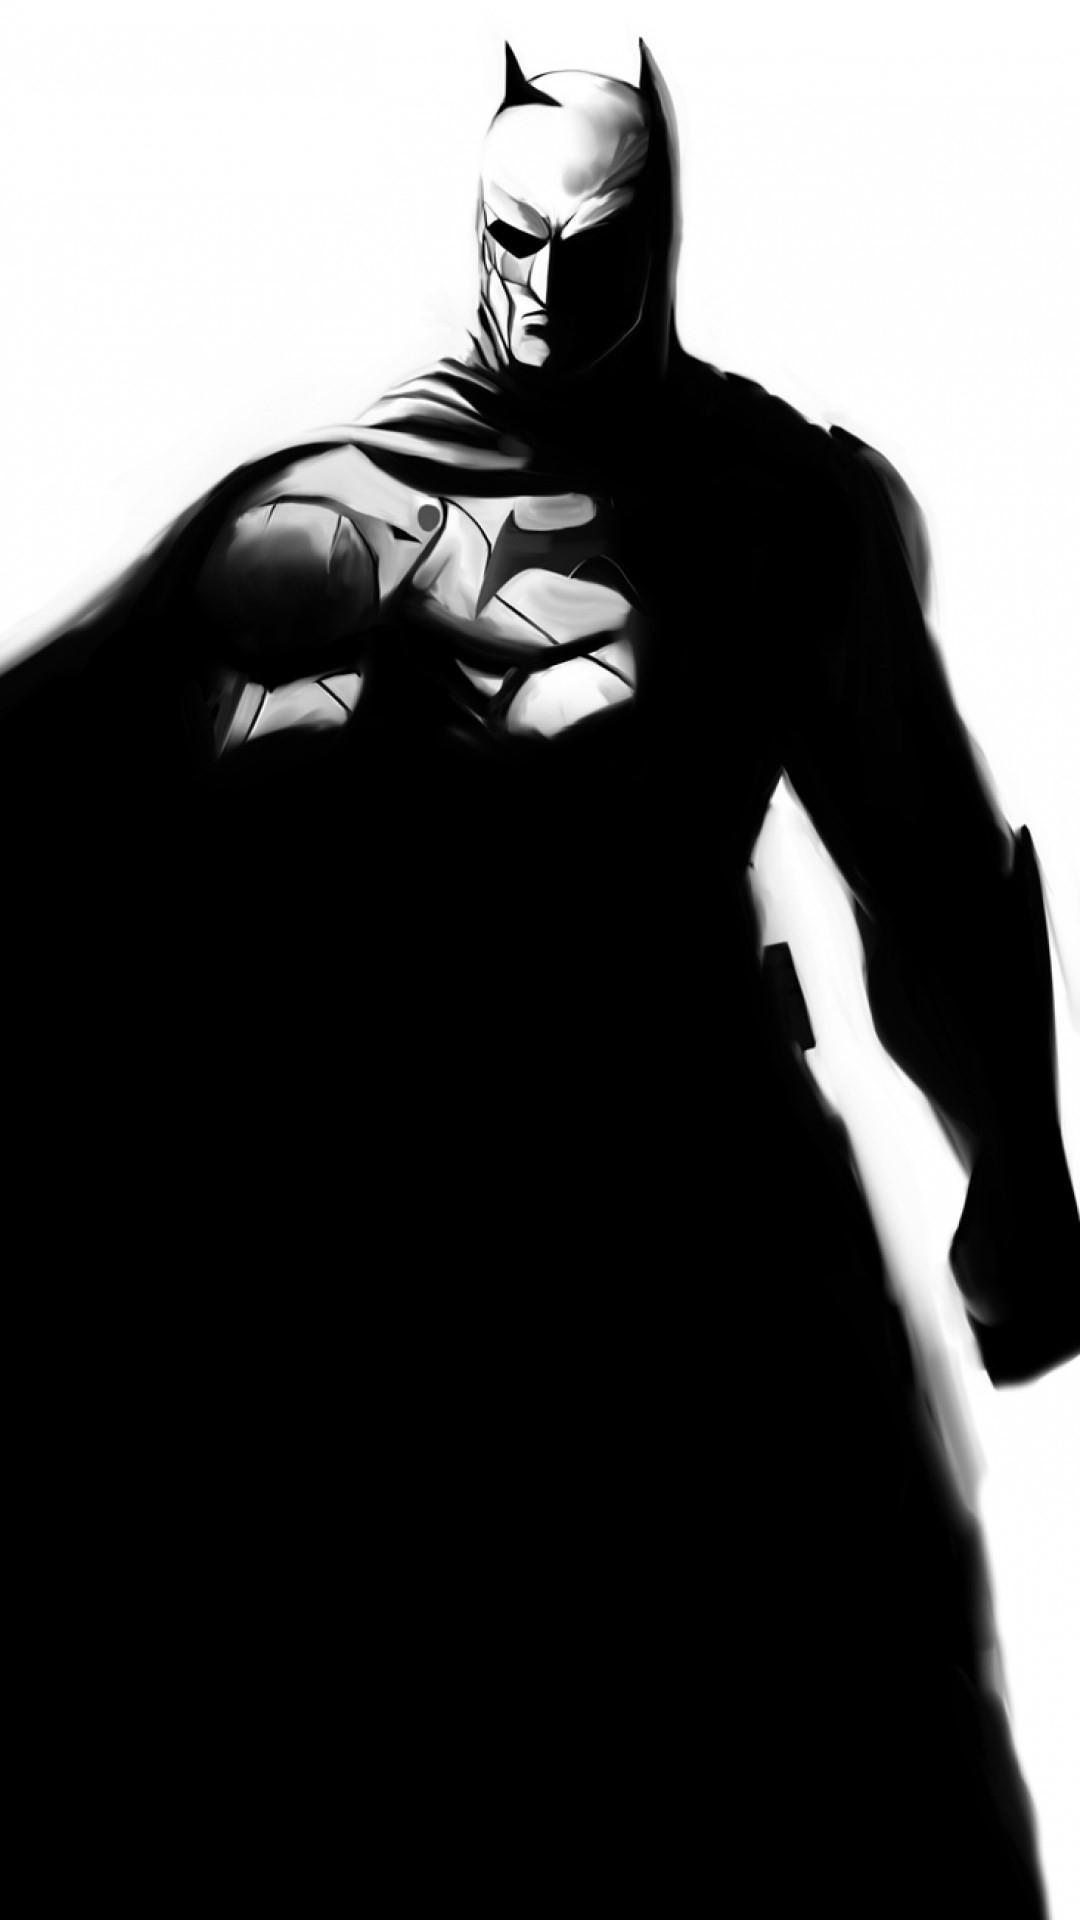 black batman iphone wallpaper high quality